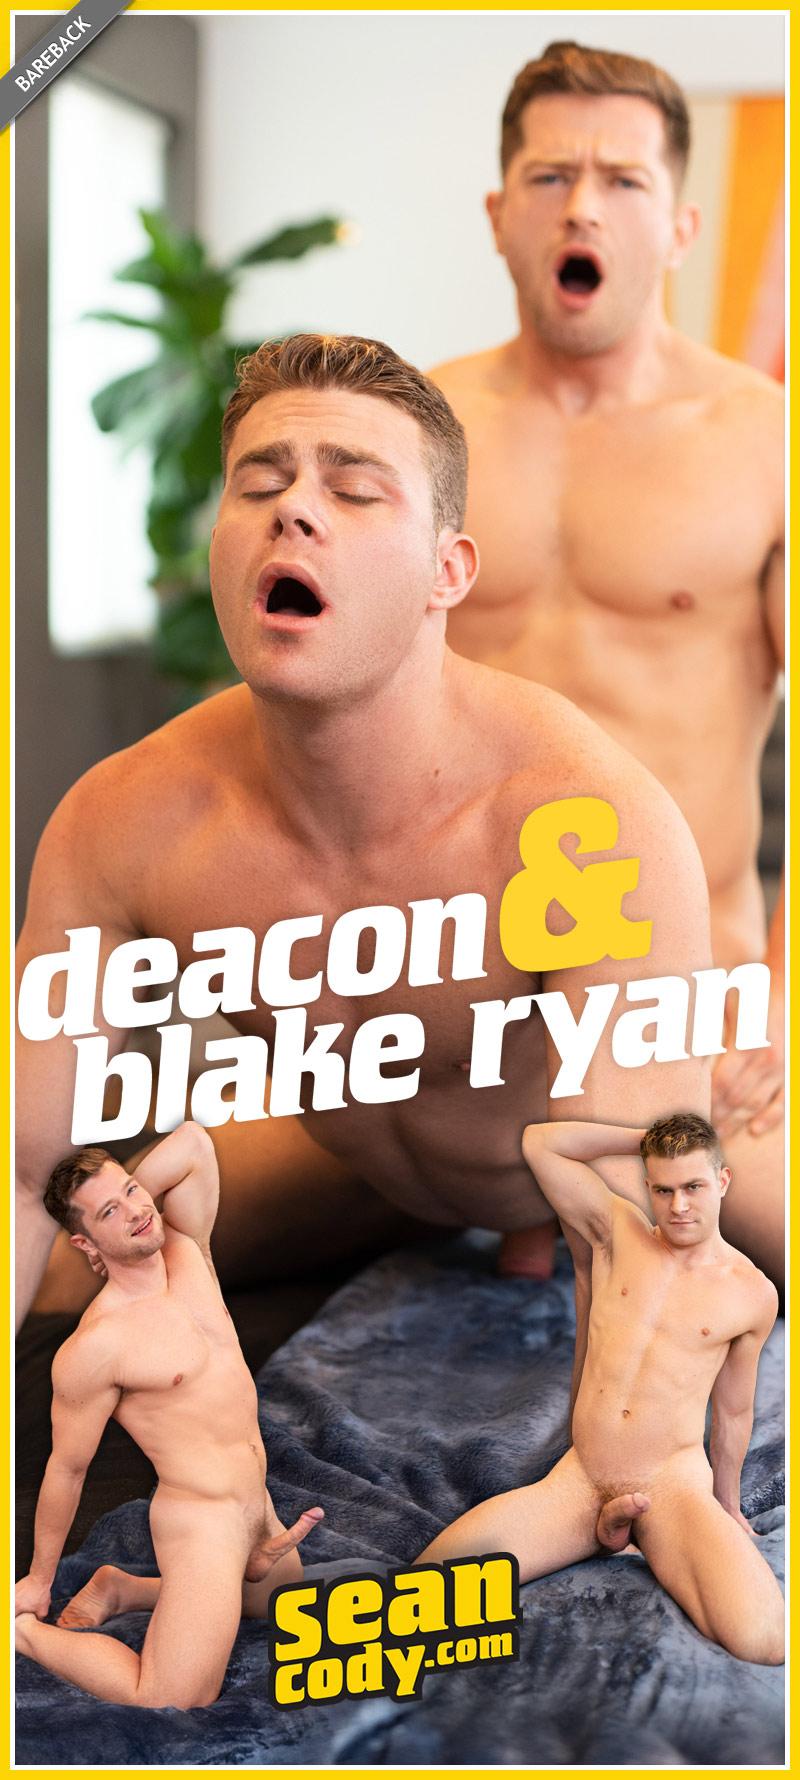 Deacon and Blake - Bareback Cover